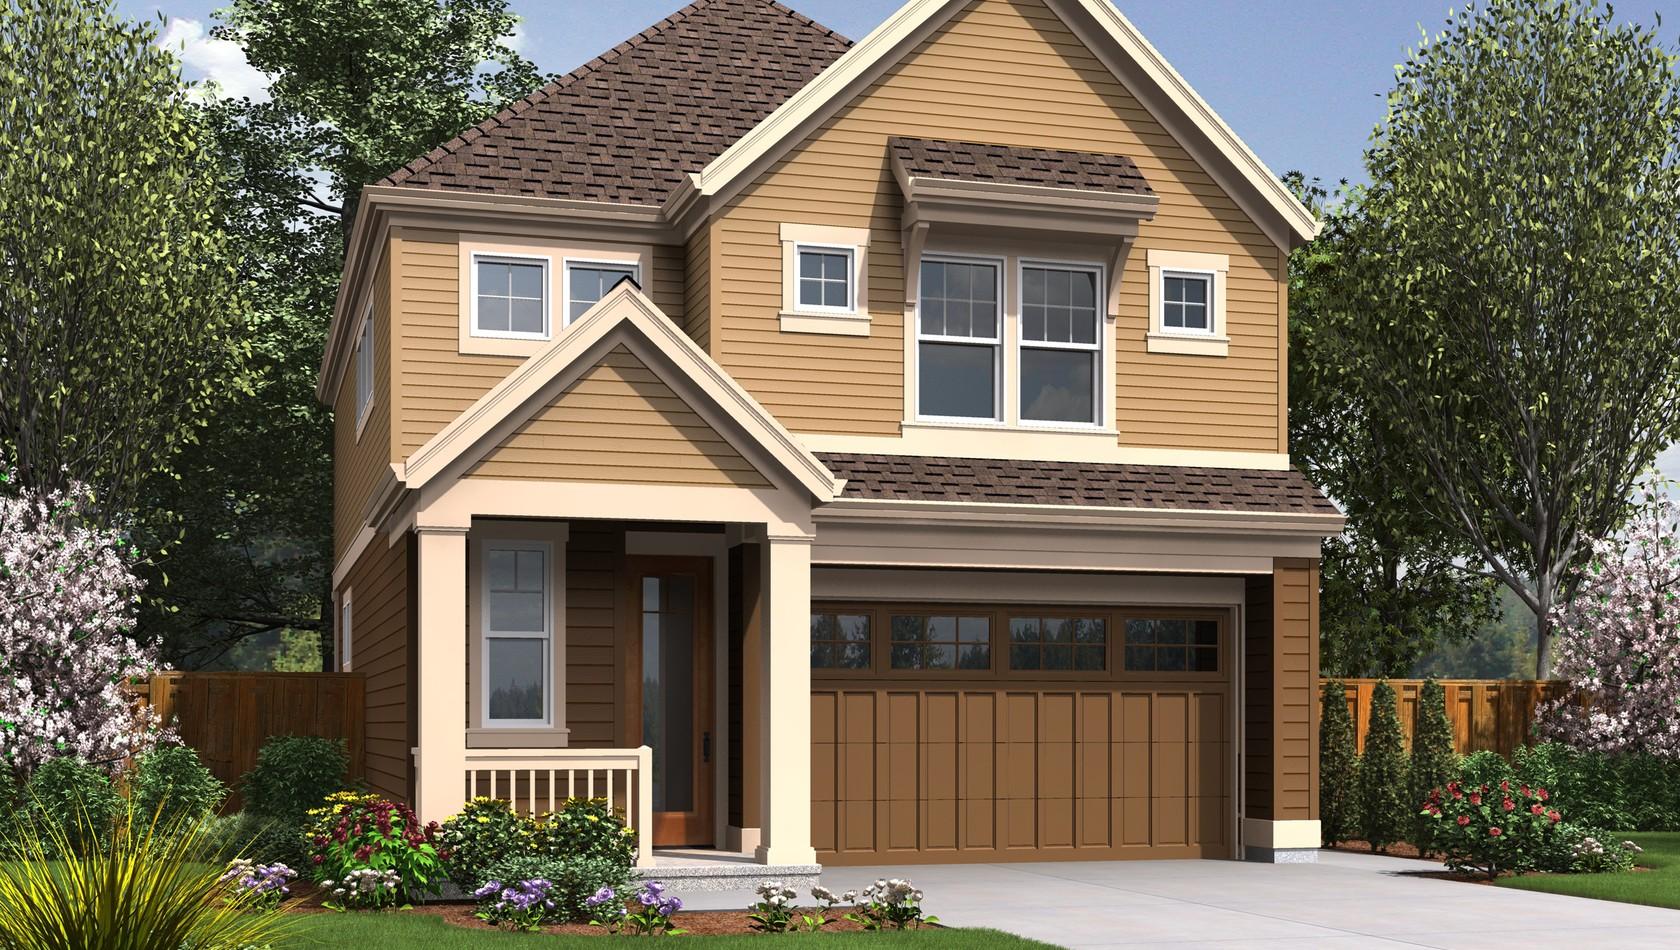 Main image for house plan 21136B: The Waldsport